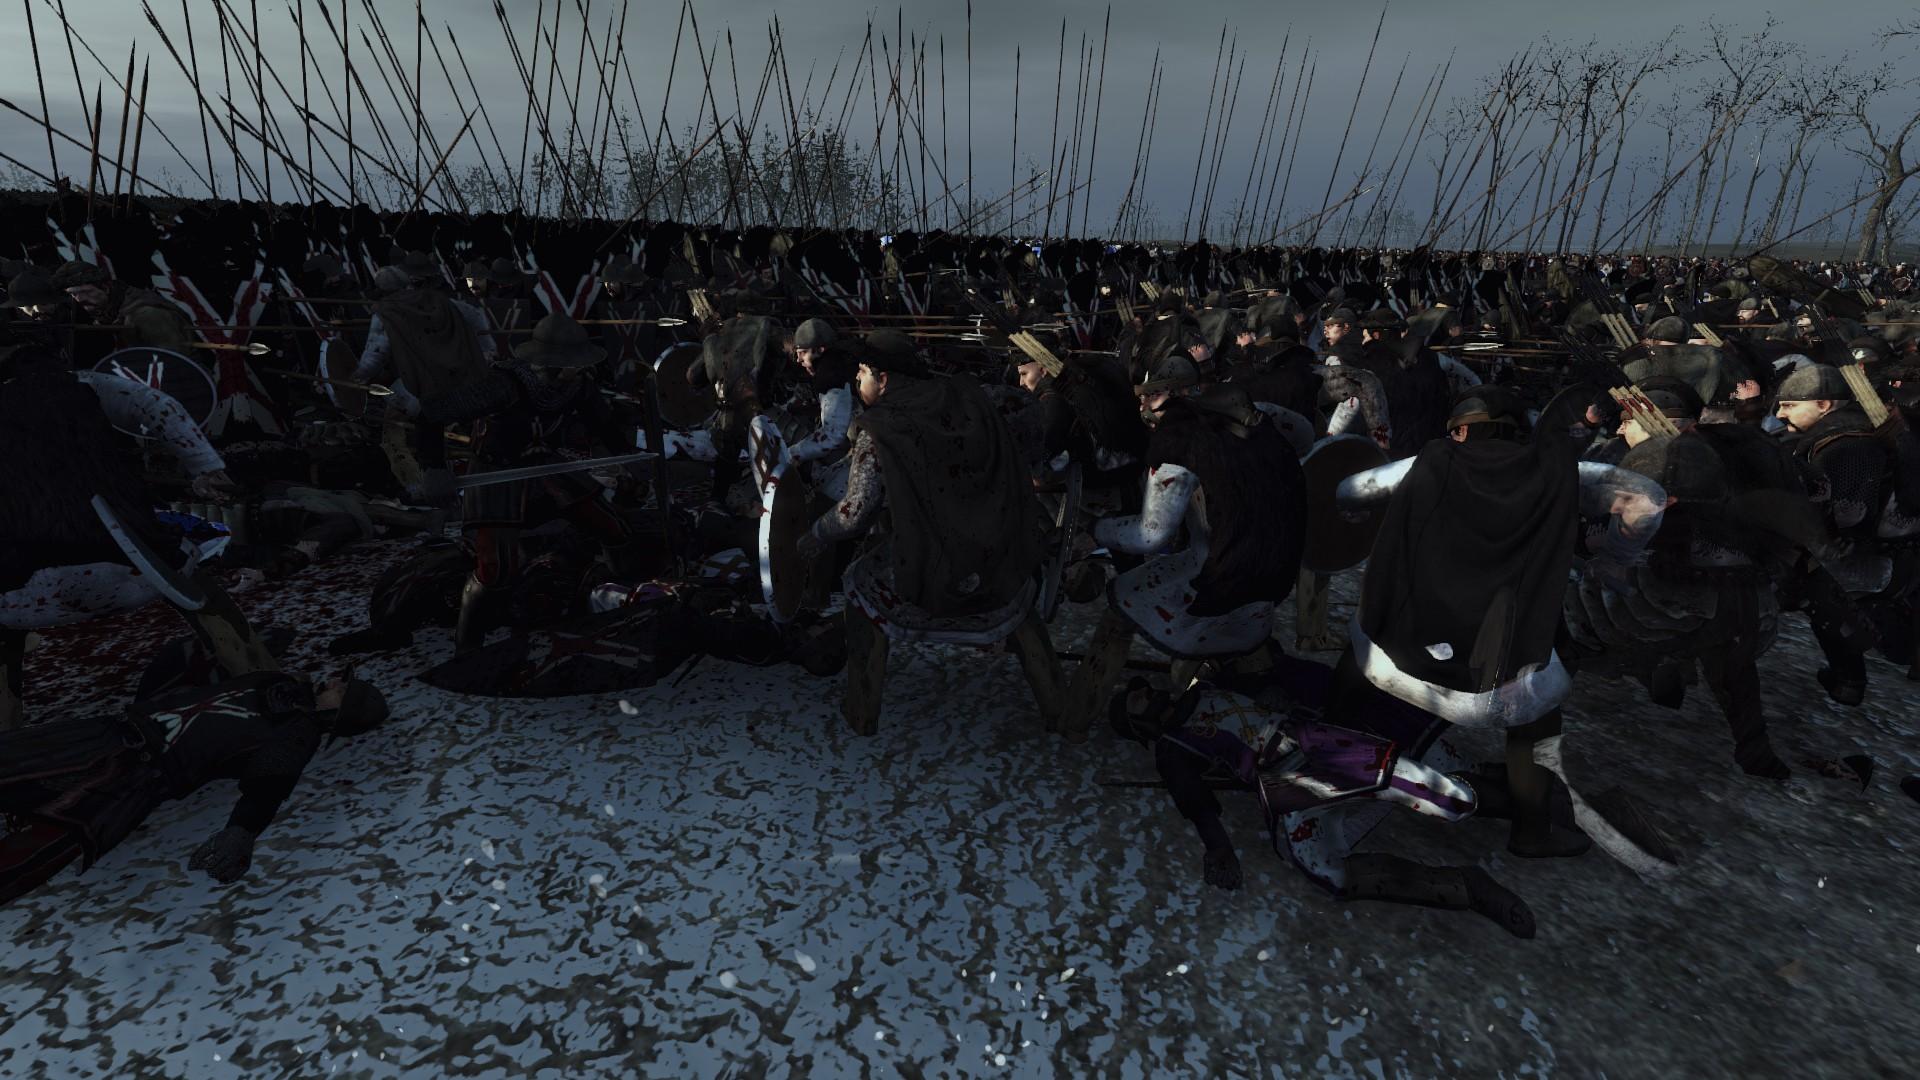 Battle Of The Bastards Total War By Morgan1501 On Deviantart